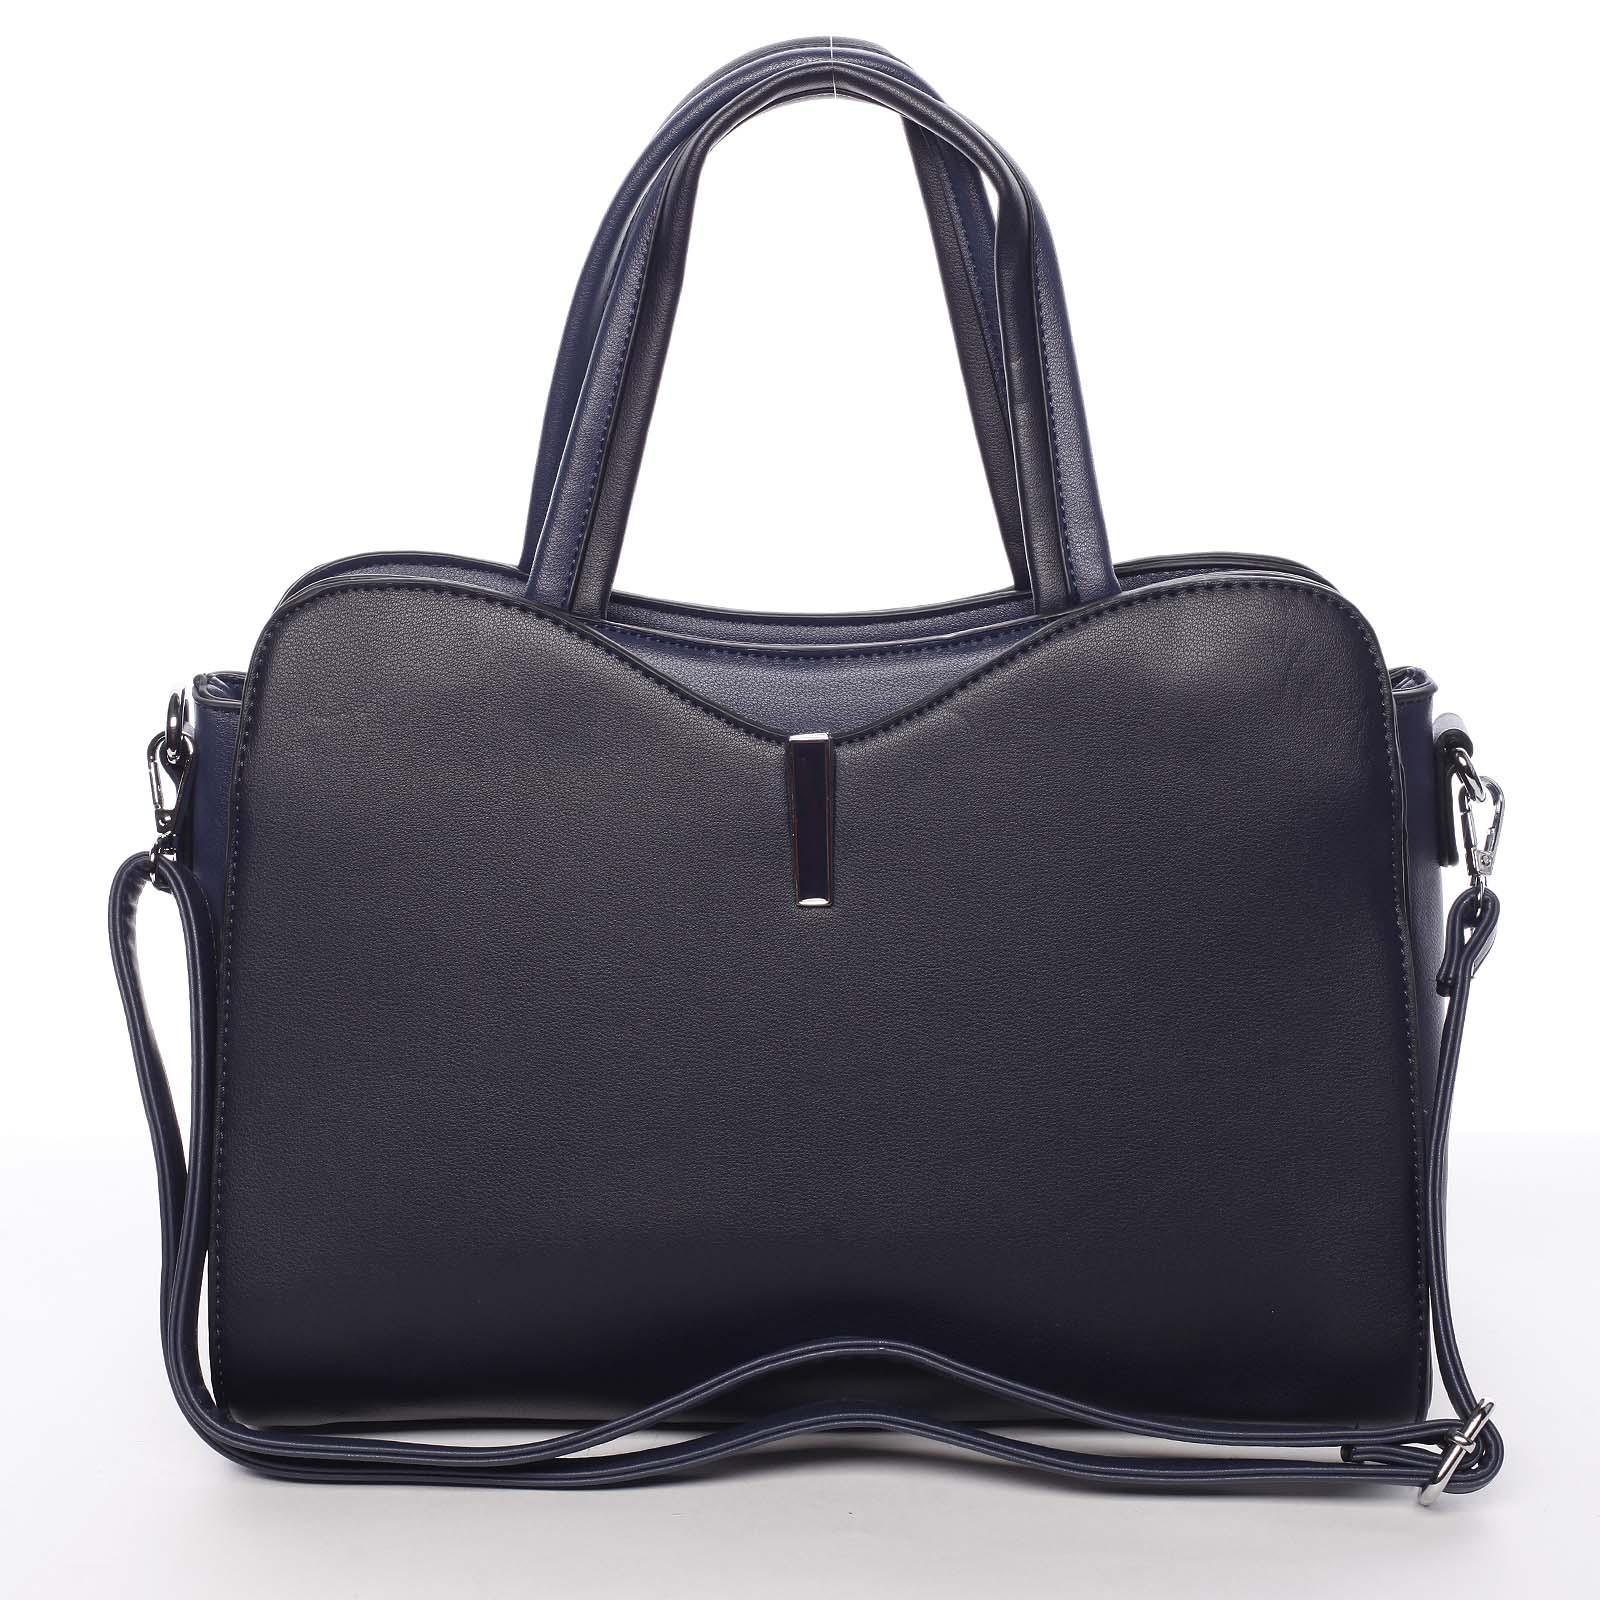 Čierna elegatná dámska kabelka do ruky tmavomodrá - Silvia Rosa Belinda modrá